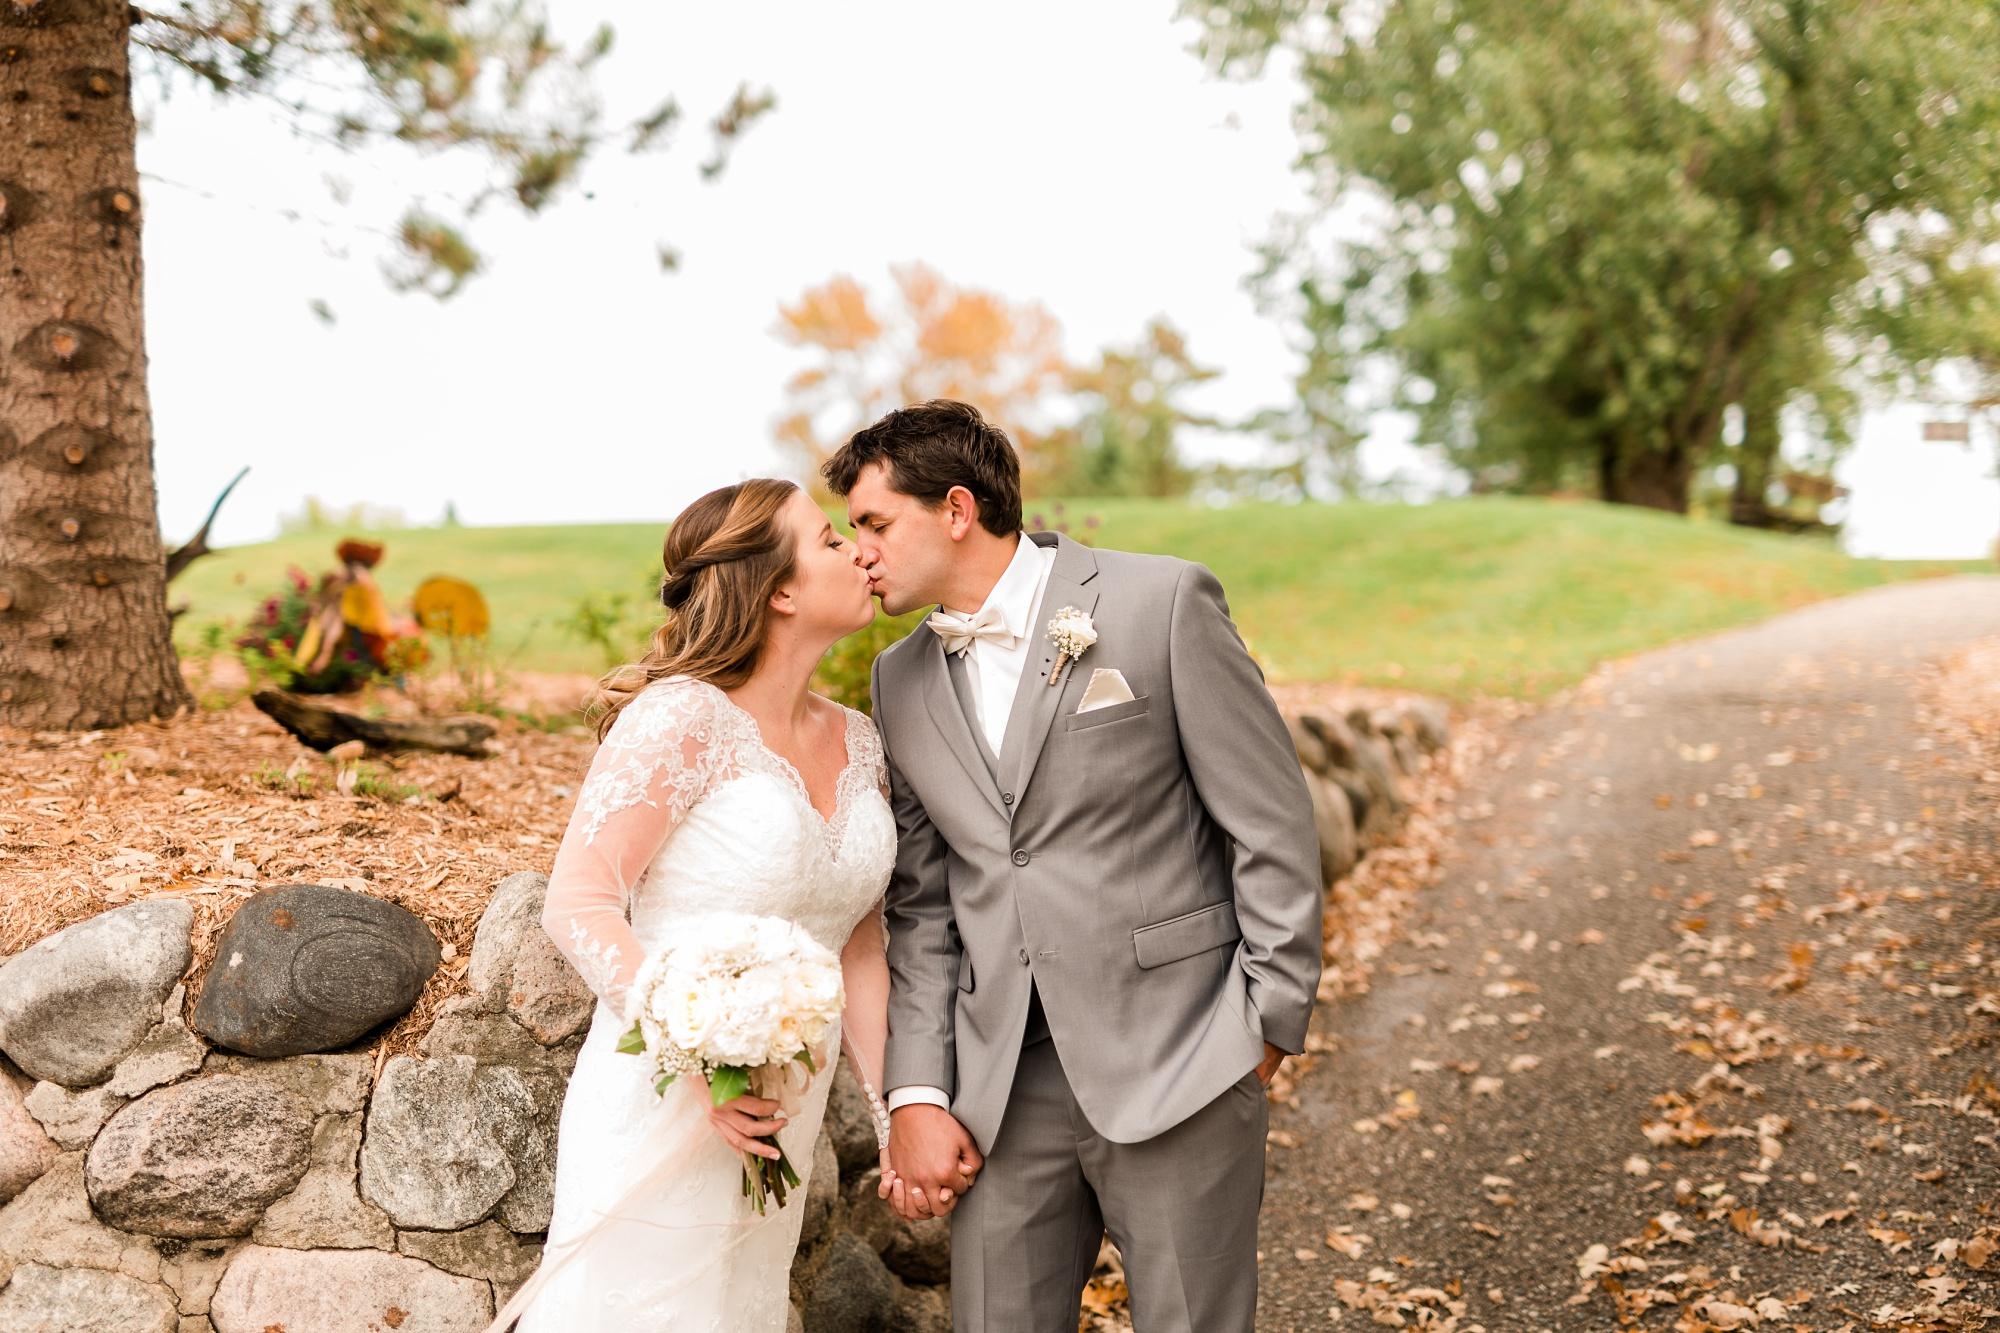 AmberLangerudPhotography_Fair Hills Resort Lakeside Wedding in Minnesota_3427.jpg